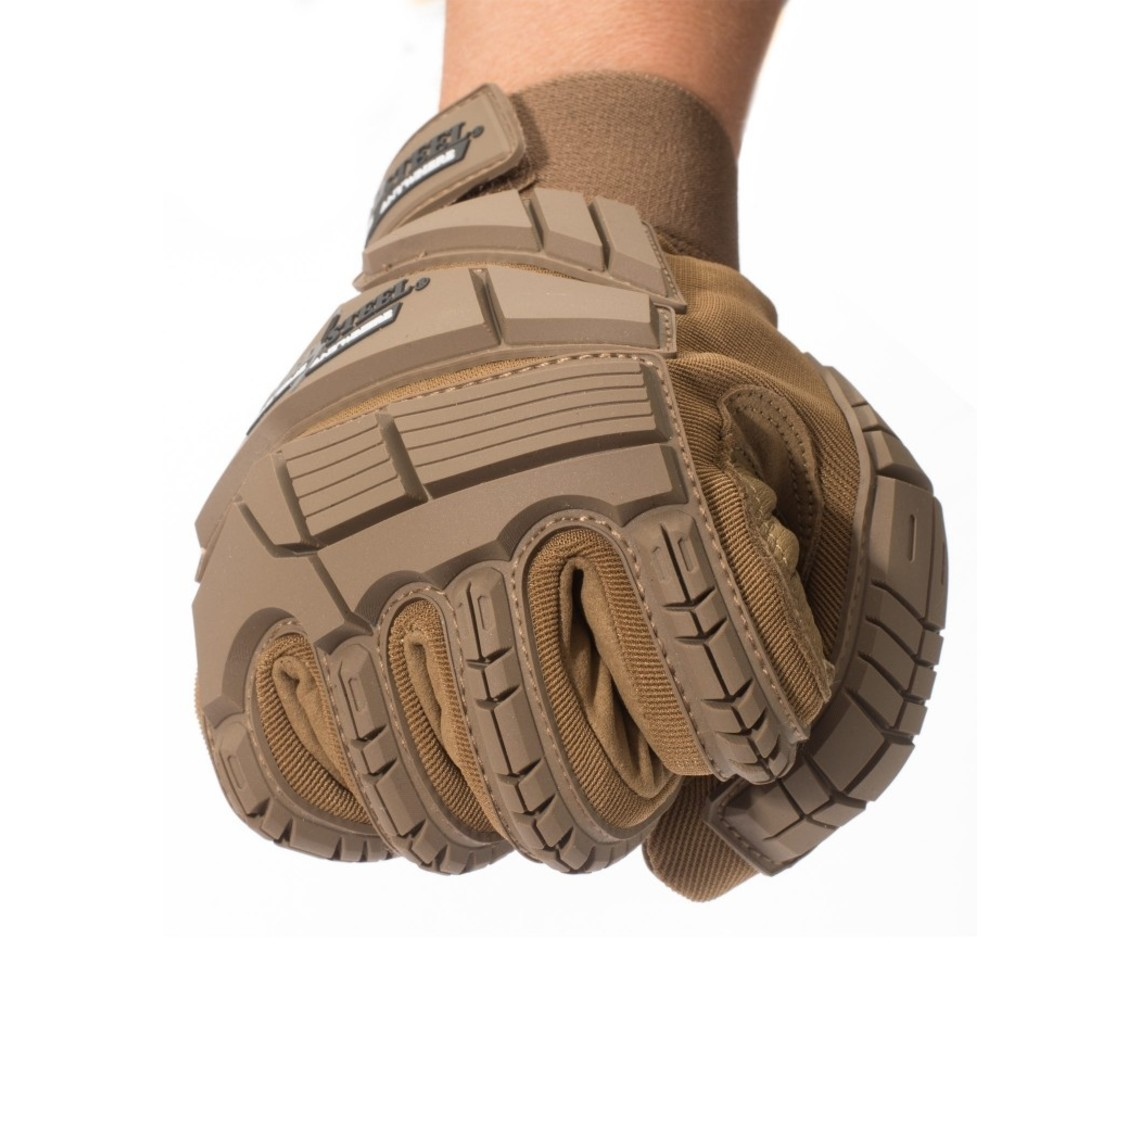 Cold Steel Tactical gloves, sand color